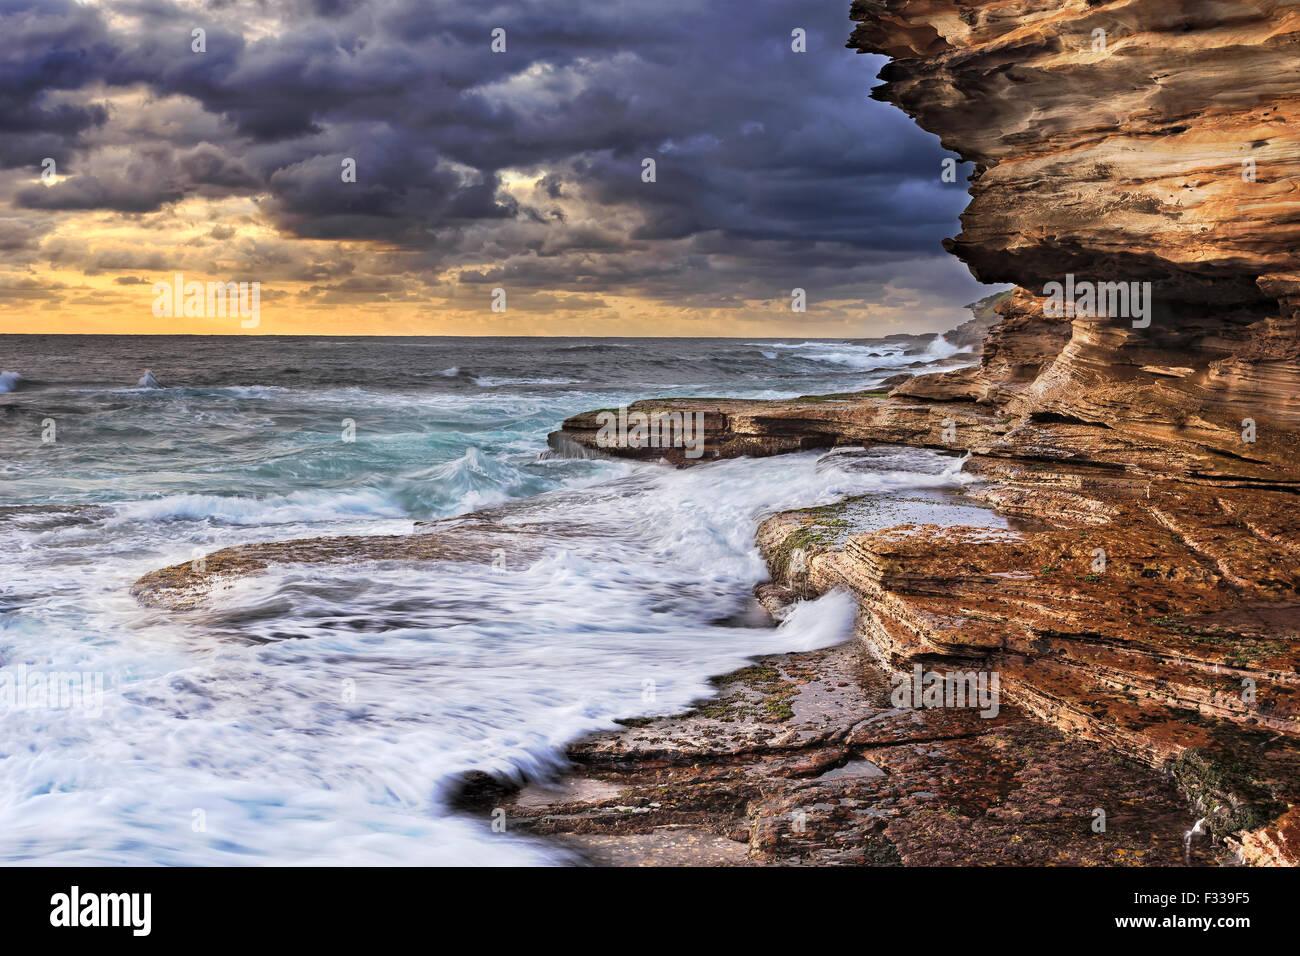 pacific ocean endless waves undermining sandstone rocks of Australian coast near Sydney during stormy sunrise - Stock Image